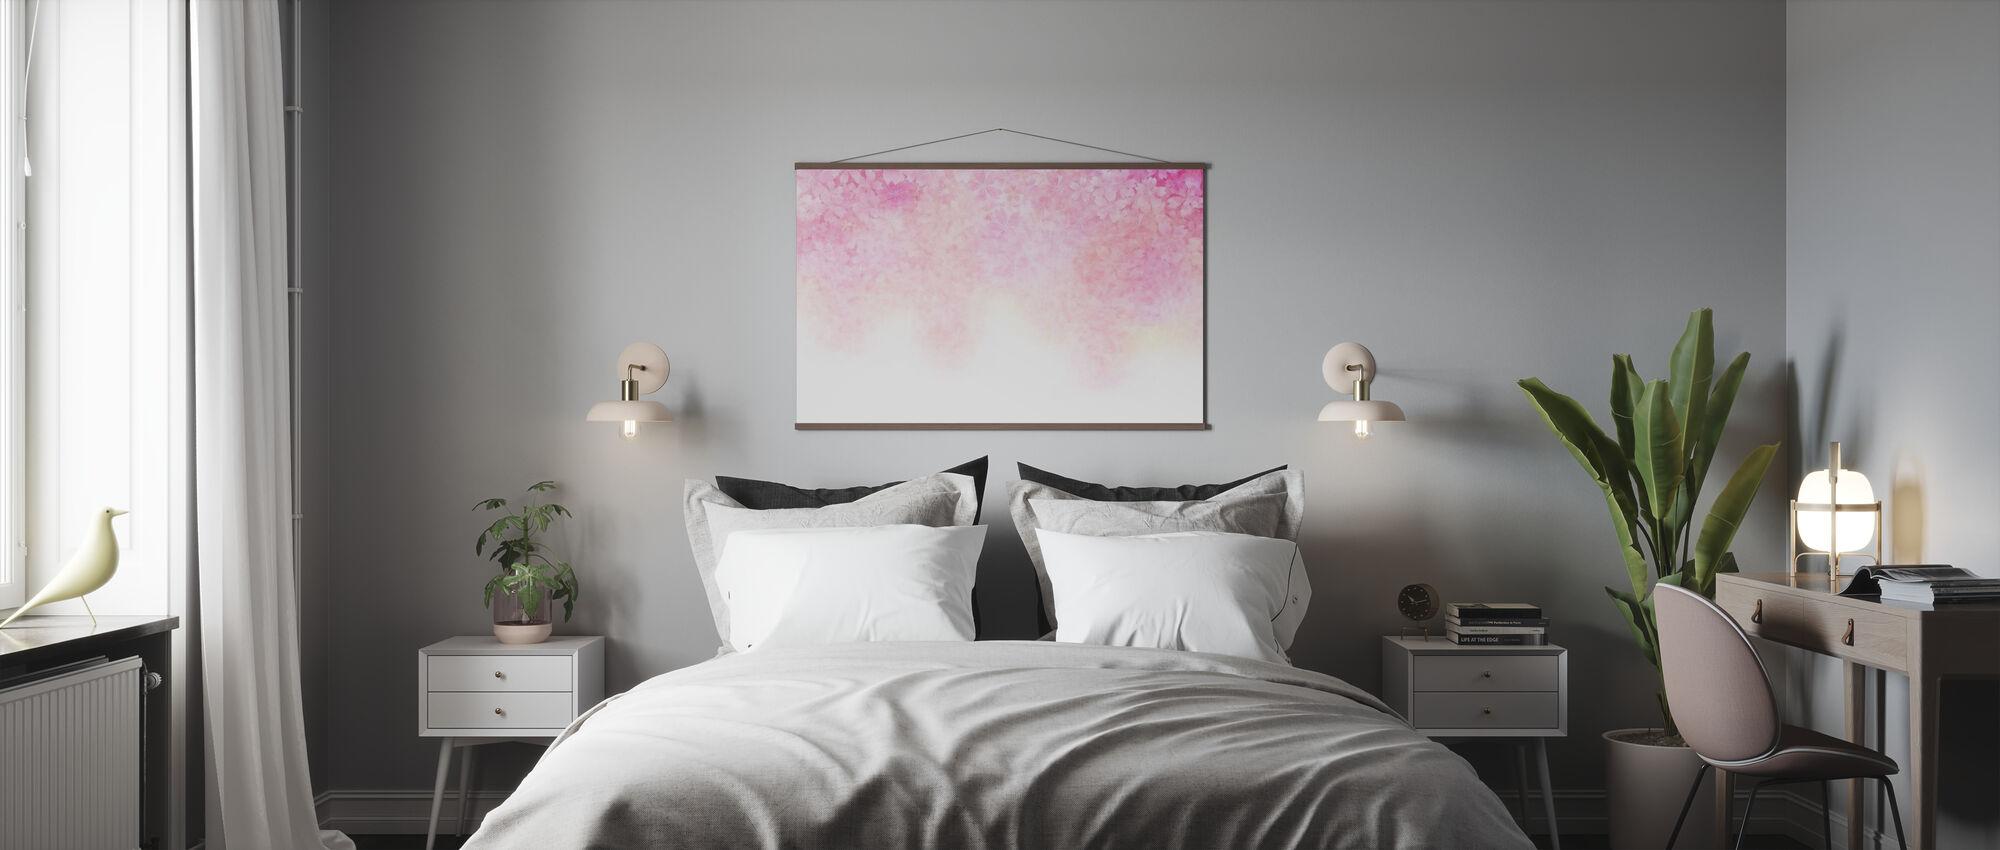 Cherry Blossom - Poster - Bedroom